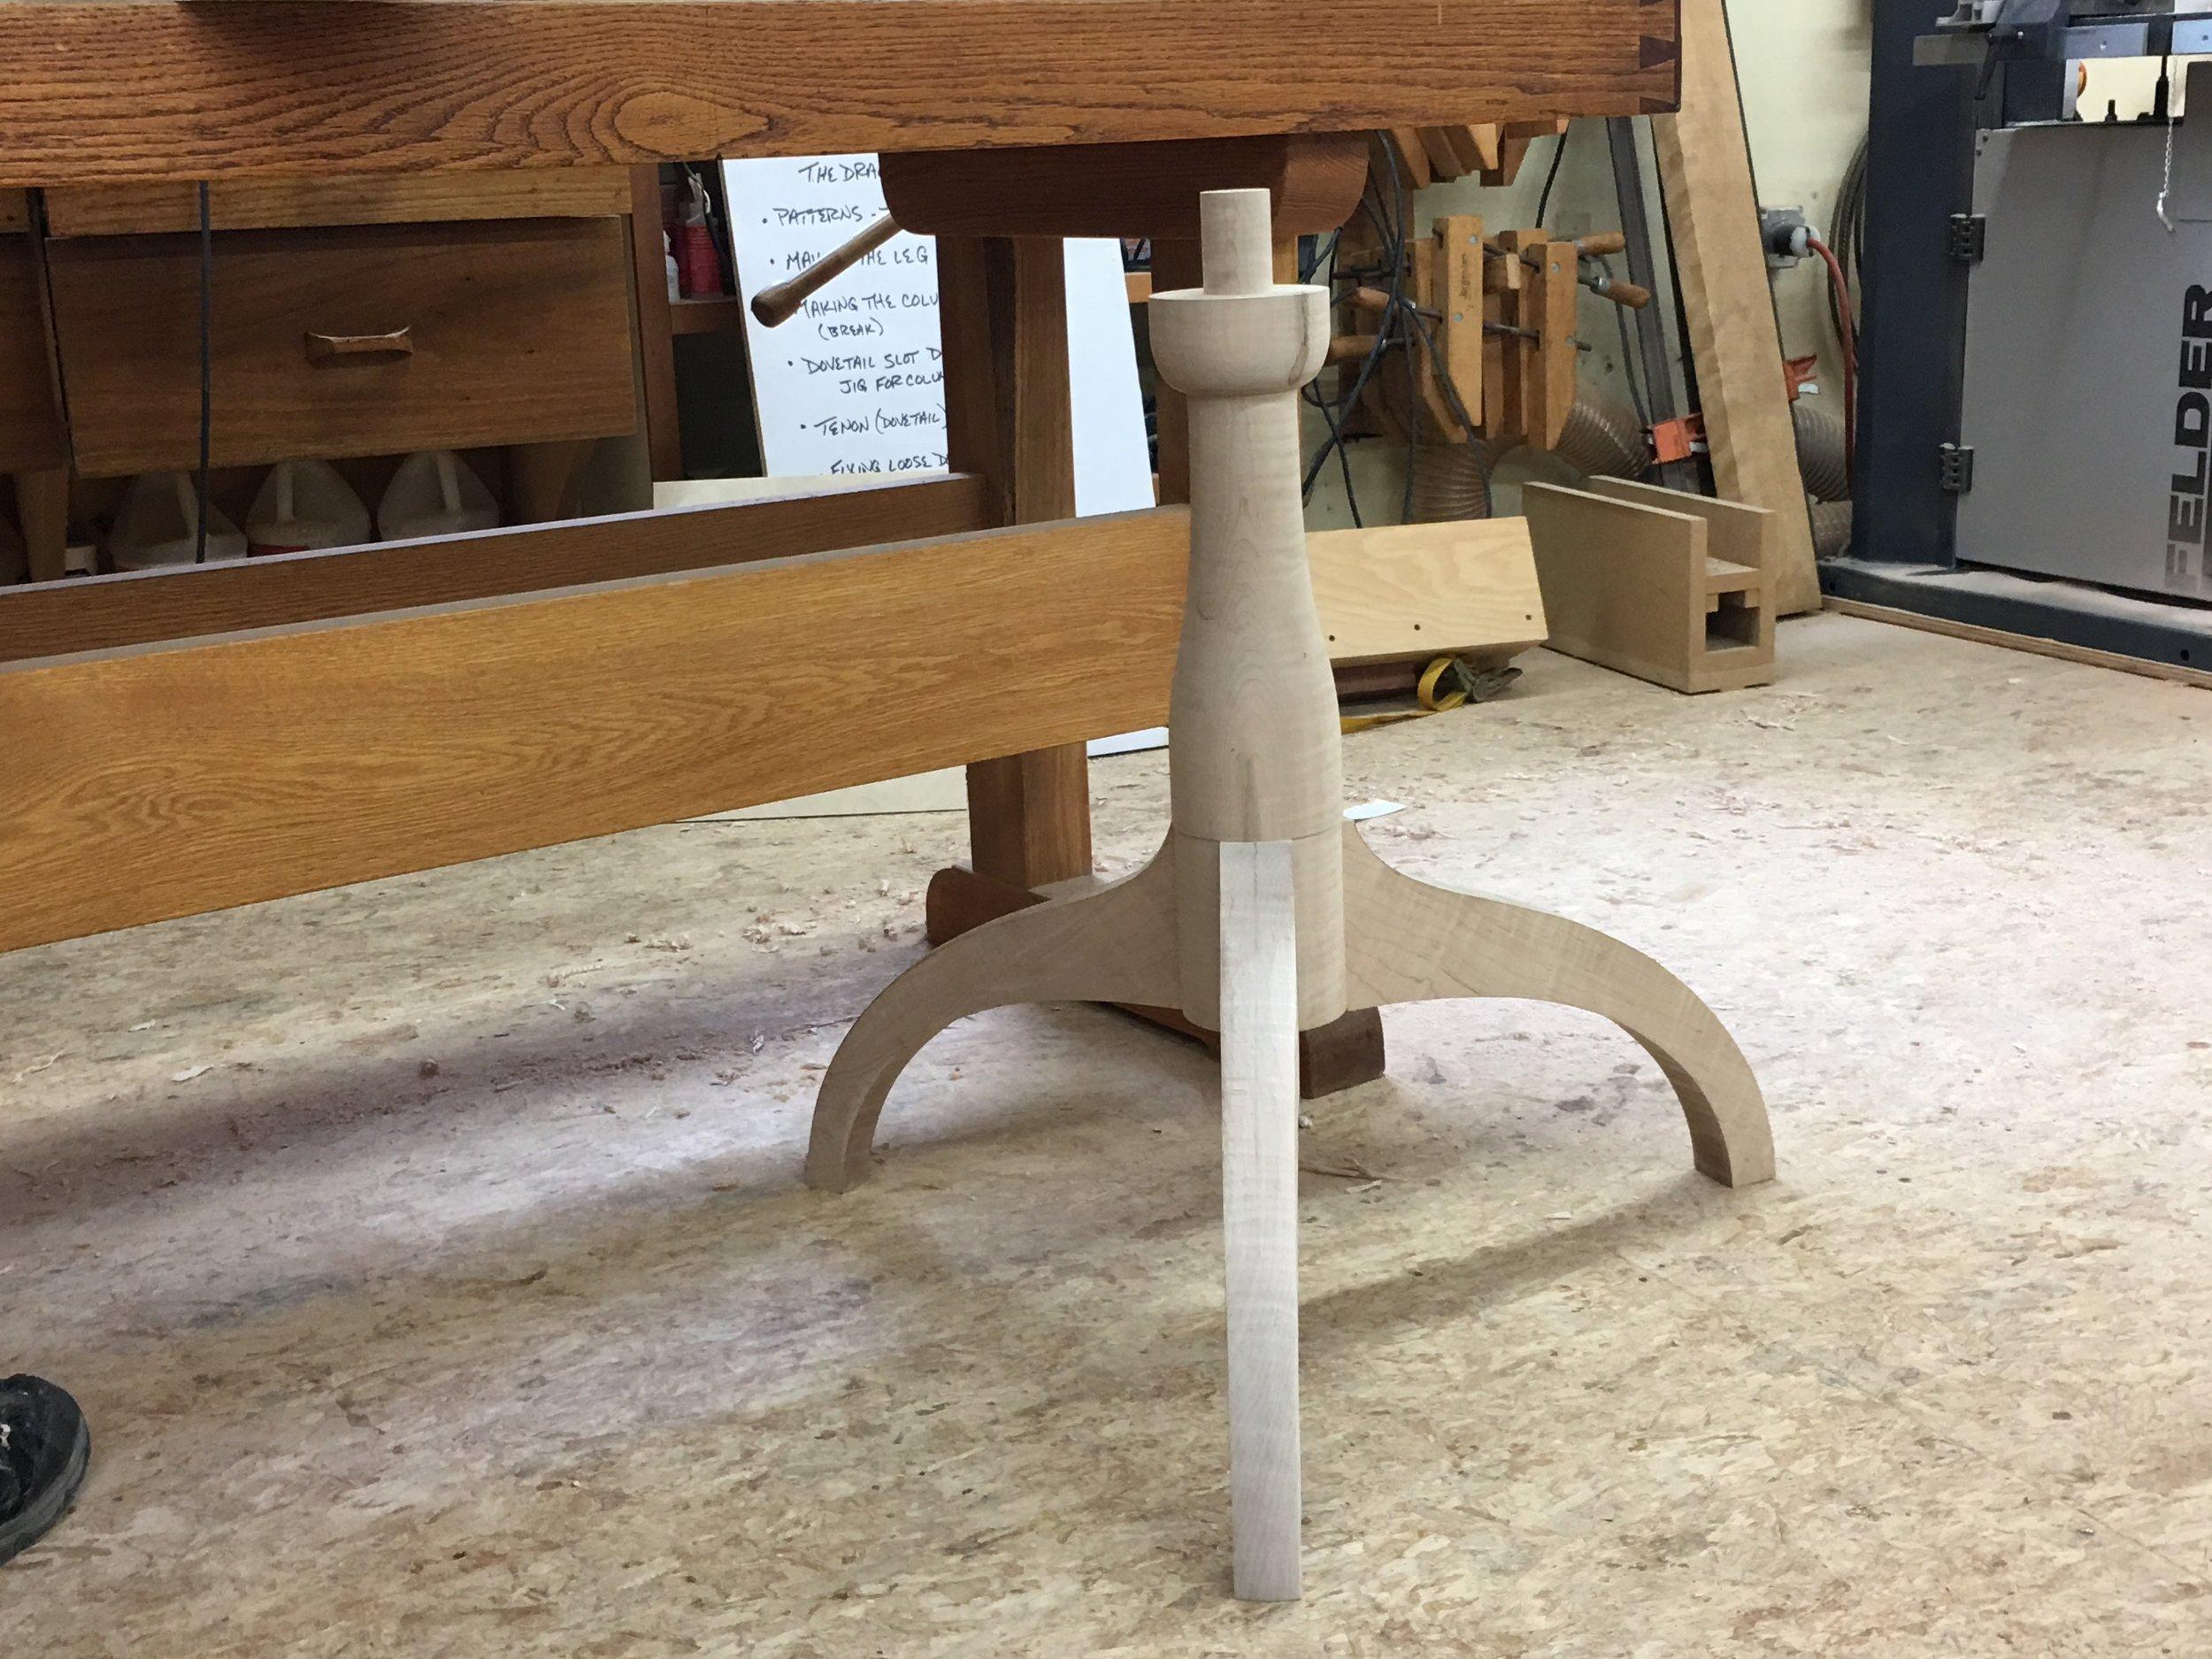 Seem-less Design for a pedestal